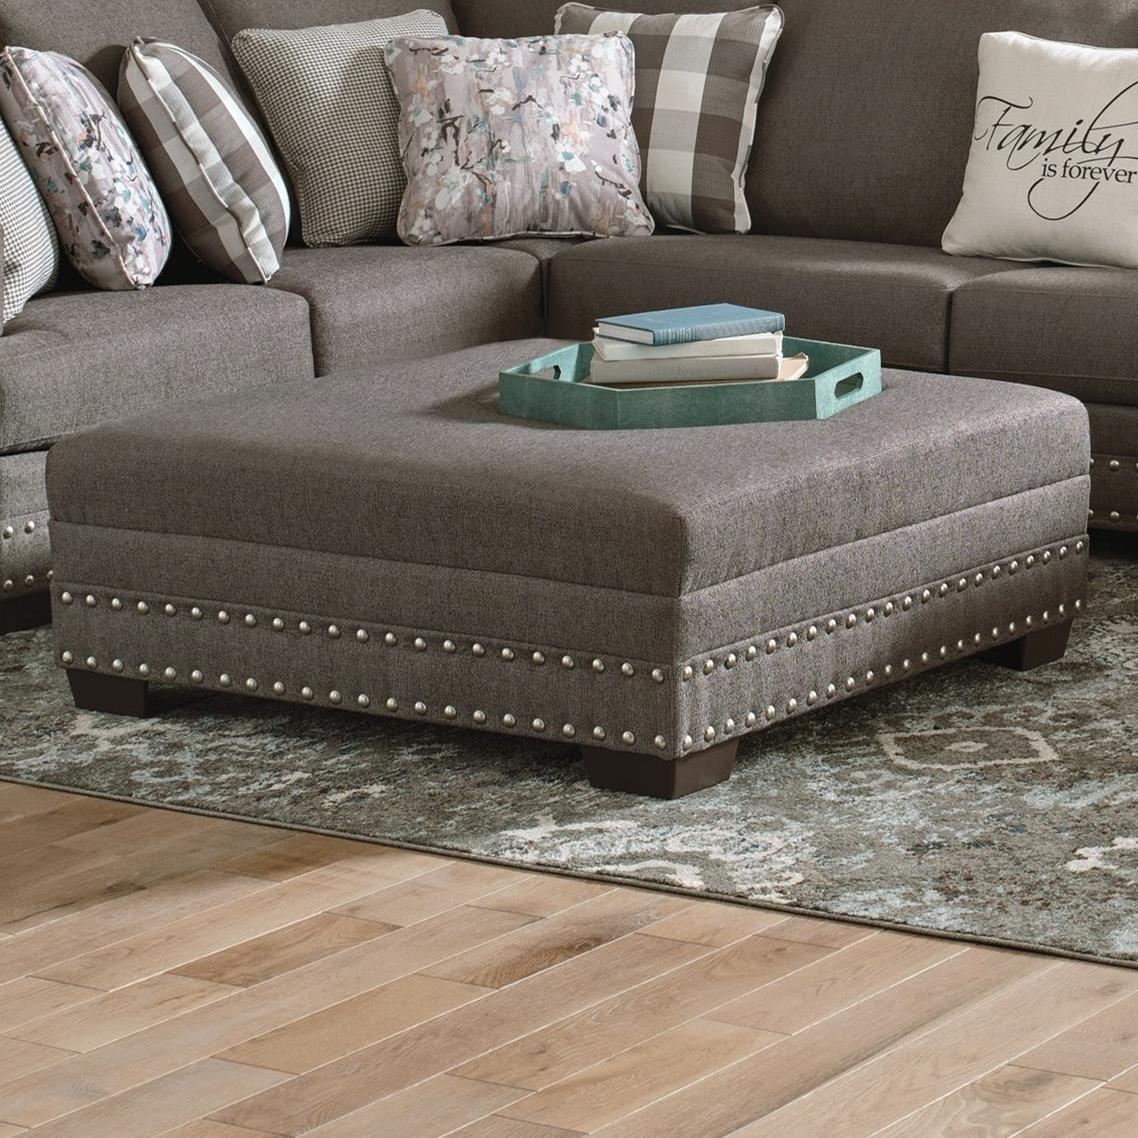 Crawford Cocktail Ottoman by Jackson Furniture at Lapeer Furniture & Mattress Center